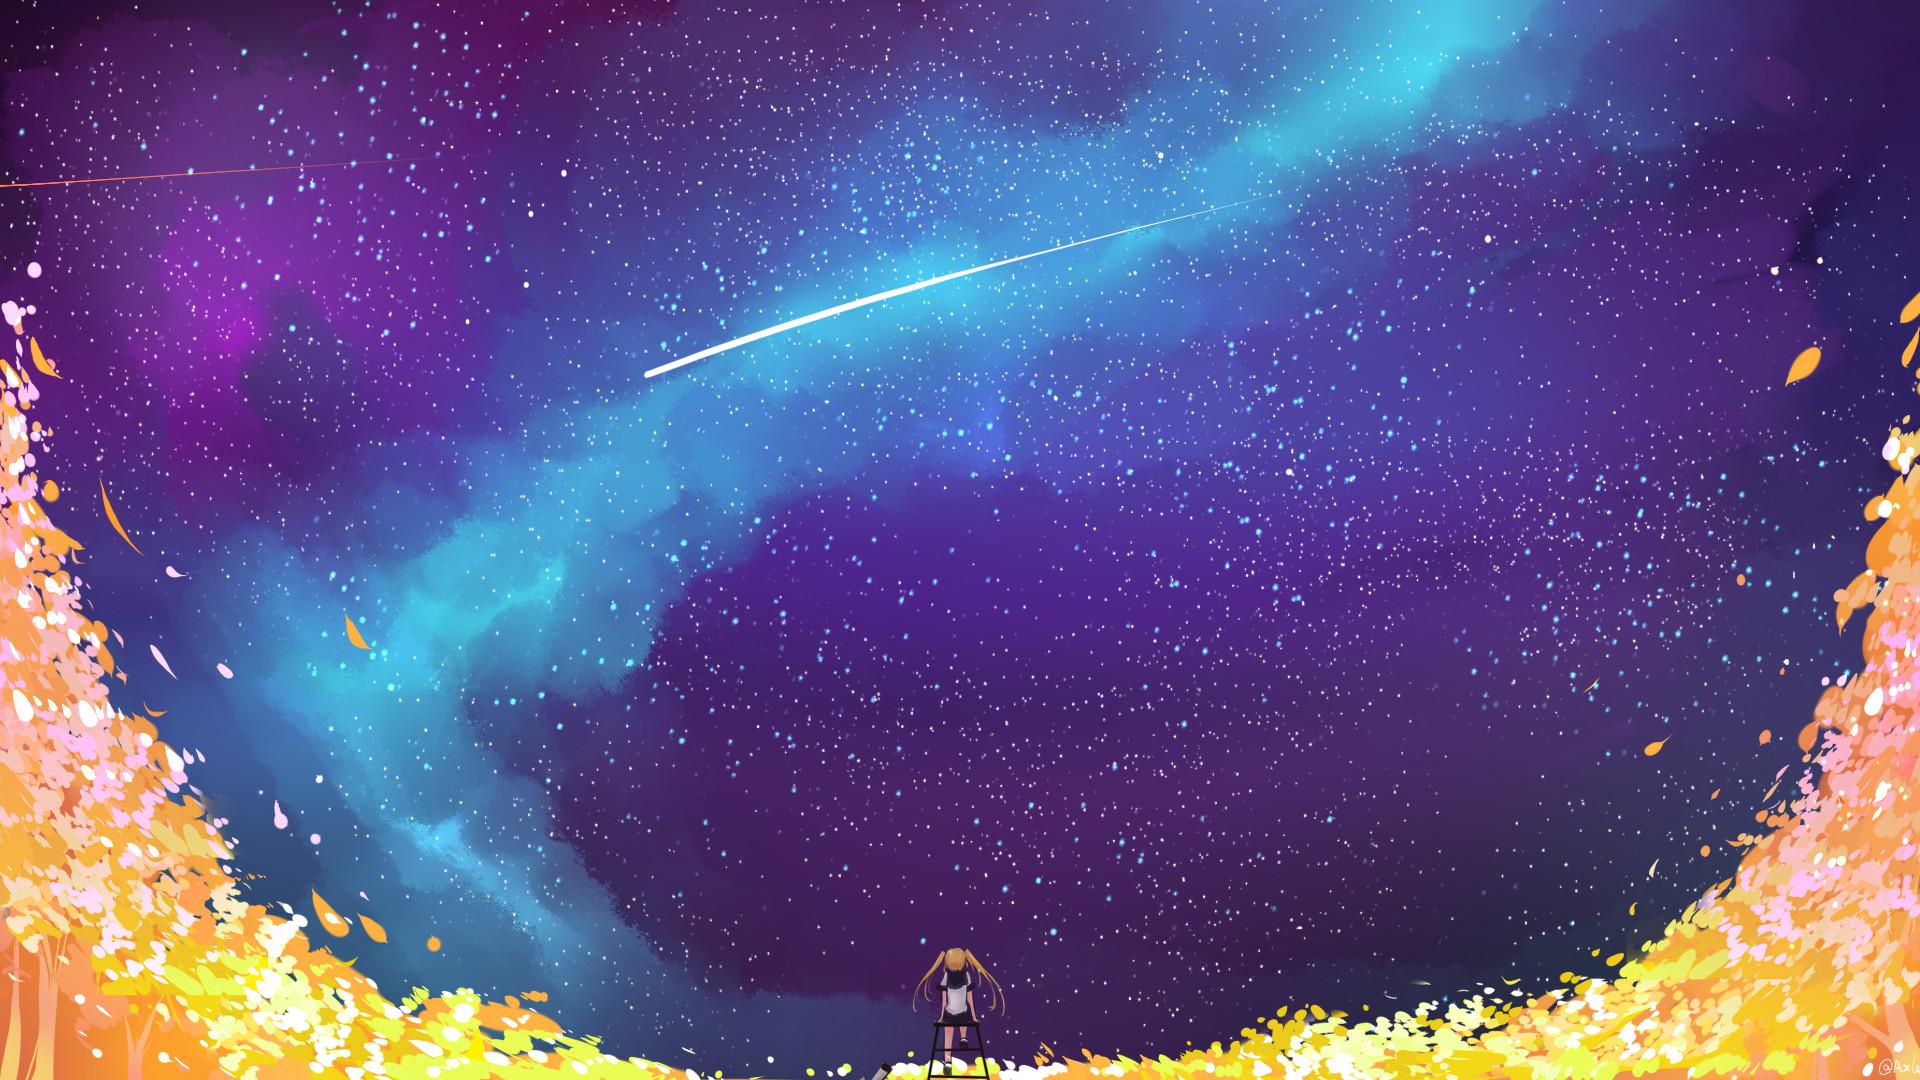 Wallpaper anime, galaxy, shooting stars, railway crossing